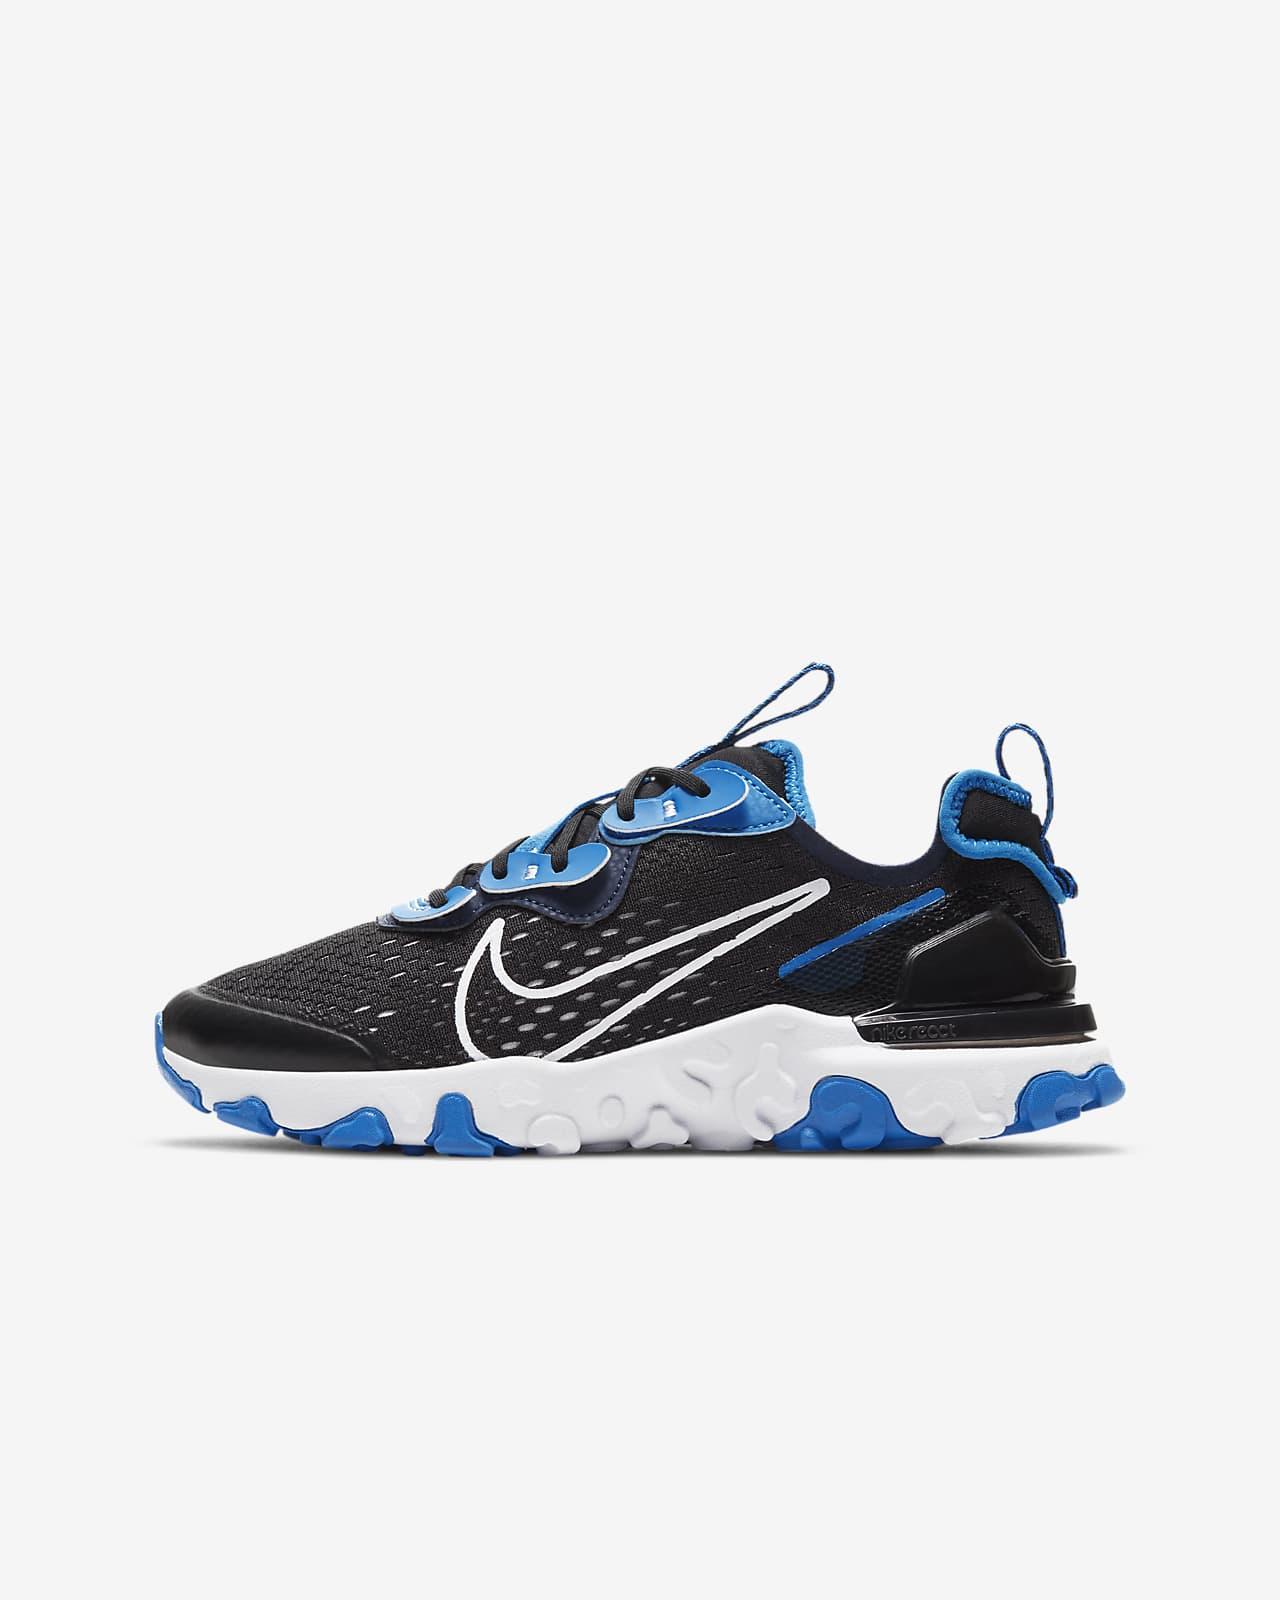 Nike React Vision Genç Çocuk Ayakkabısı